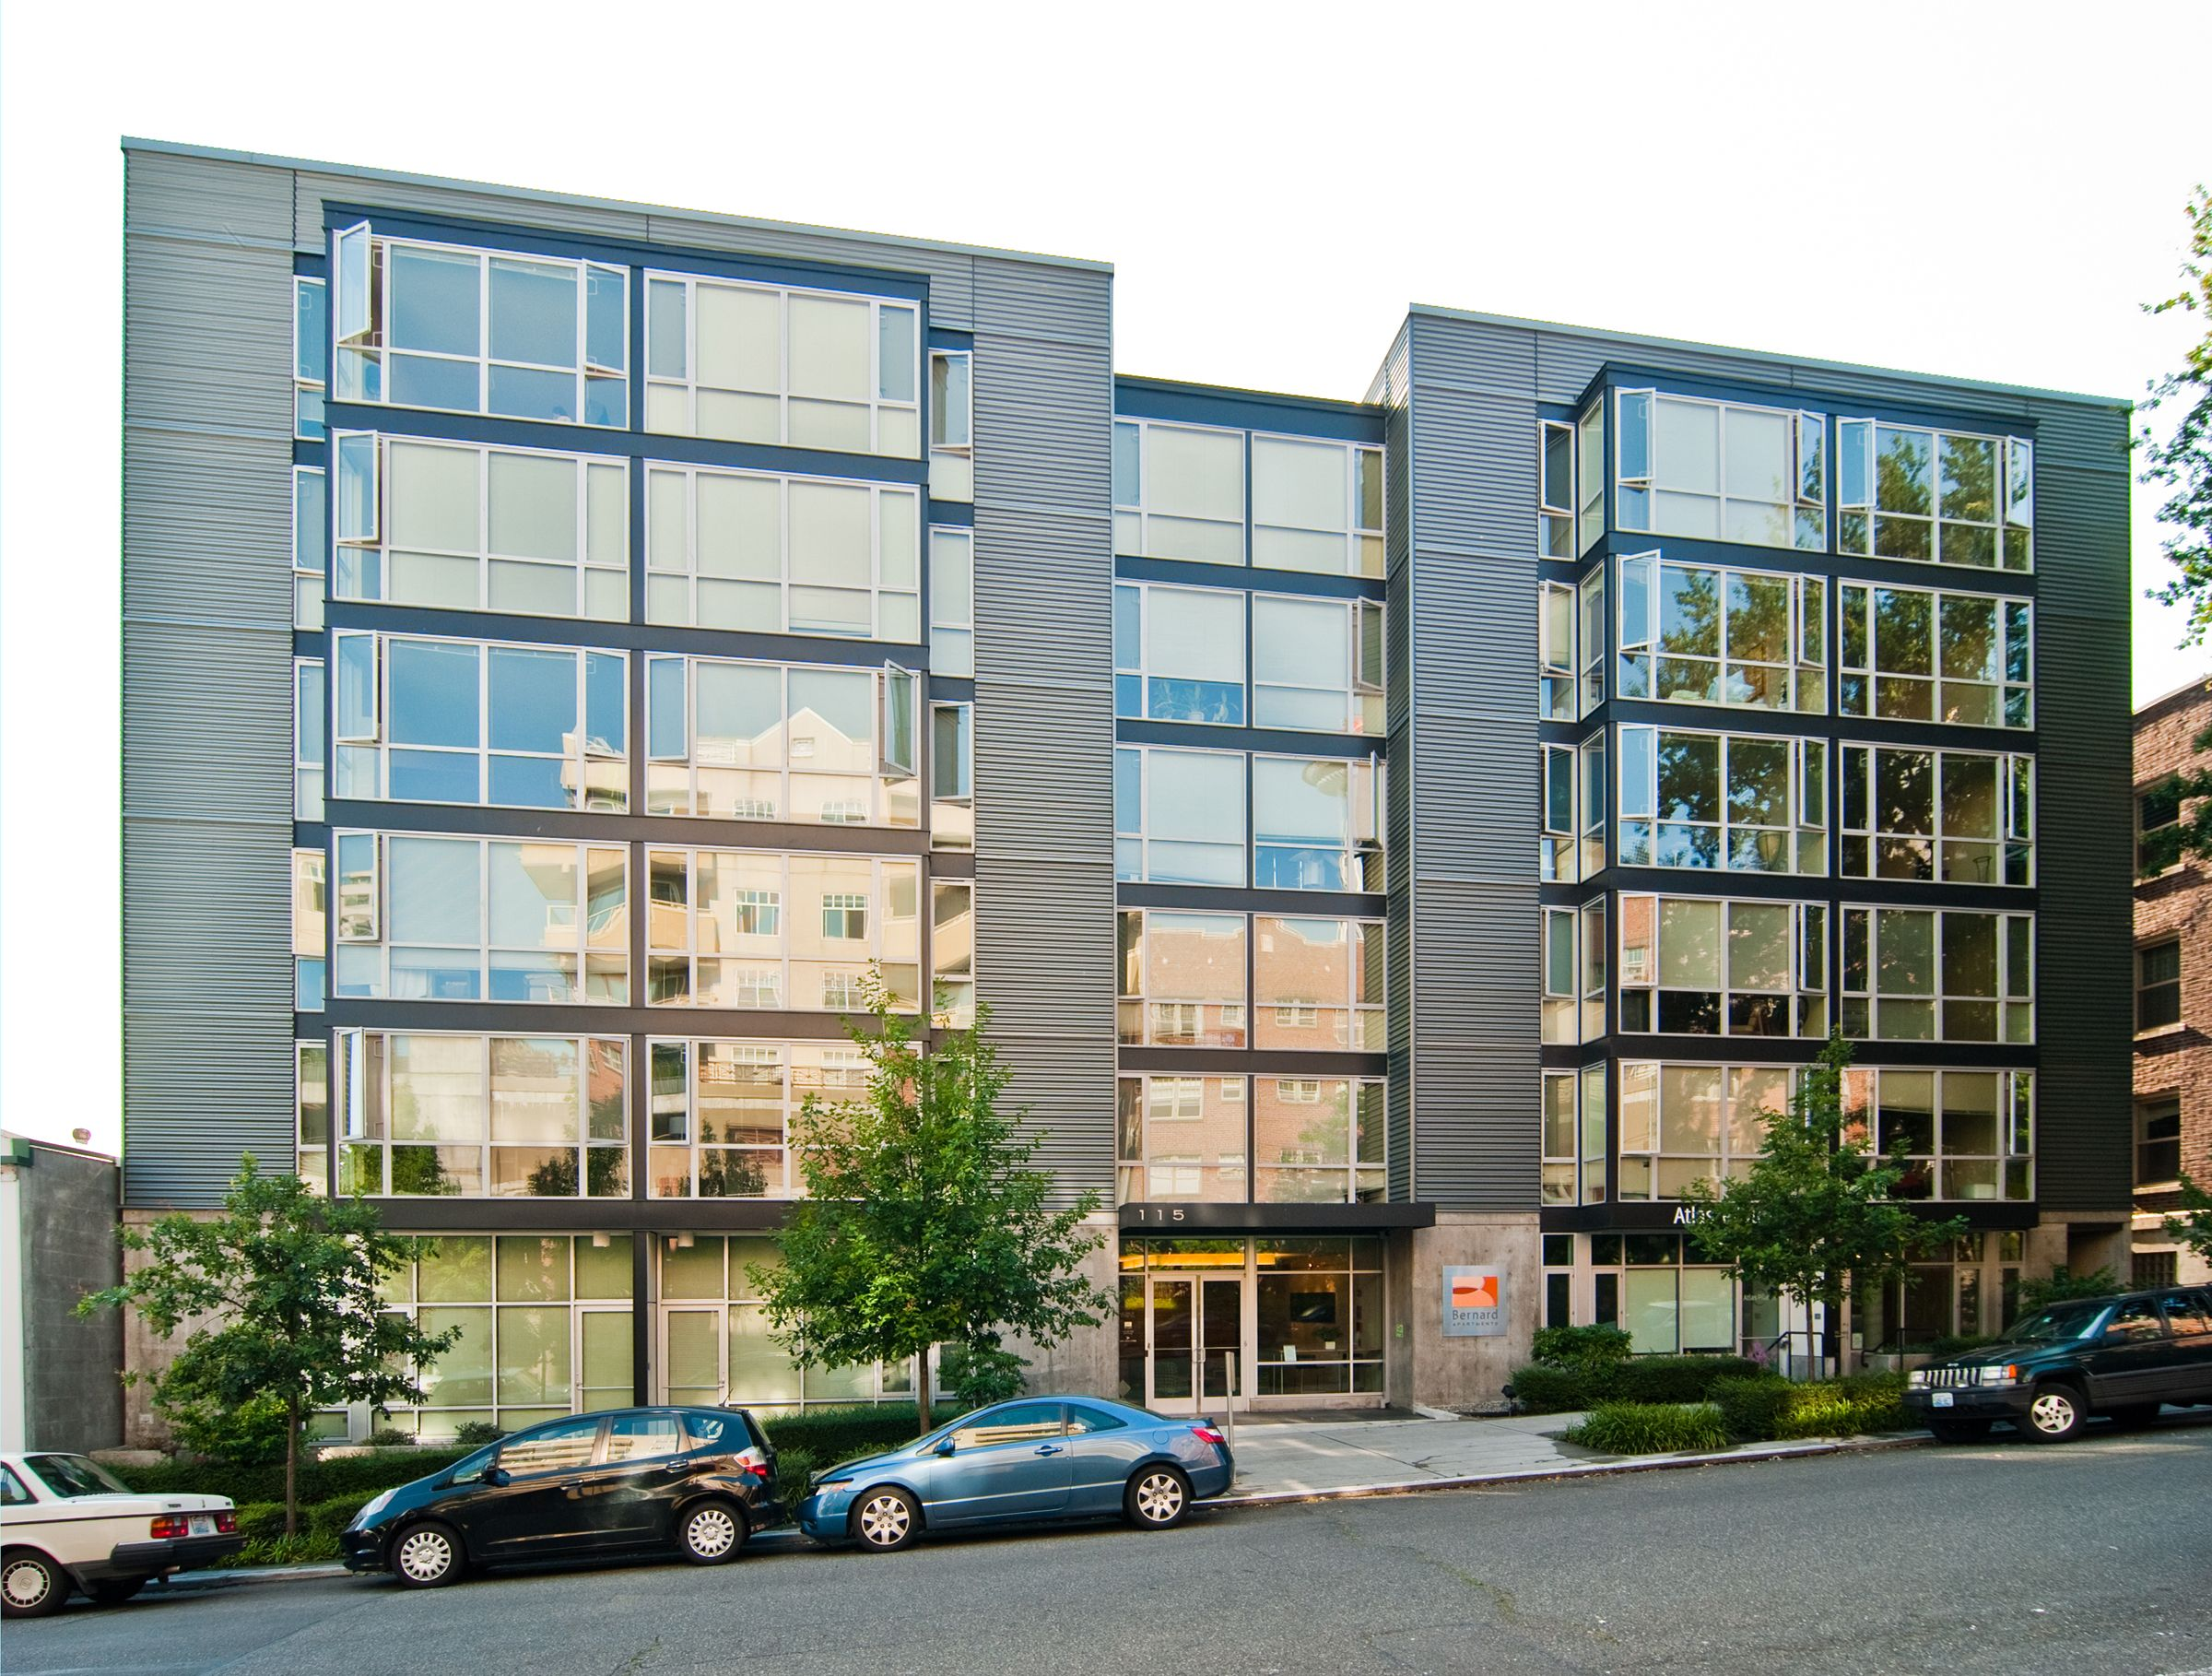 Best Images About Home Vision On Pinterest Studios - Modern apartment design exterior